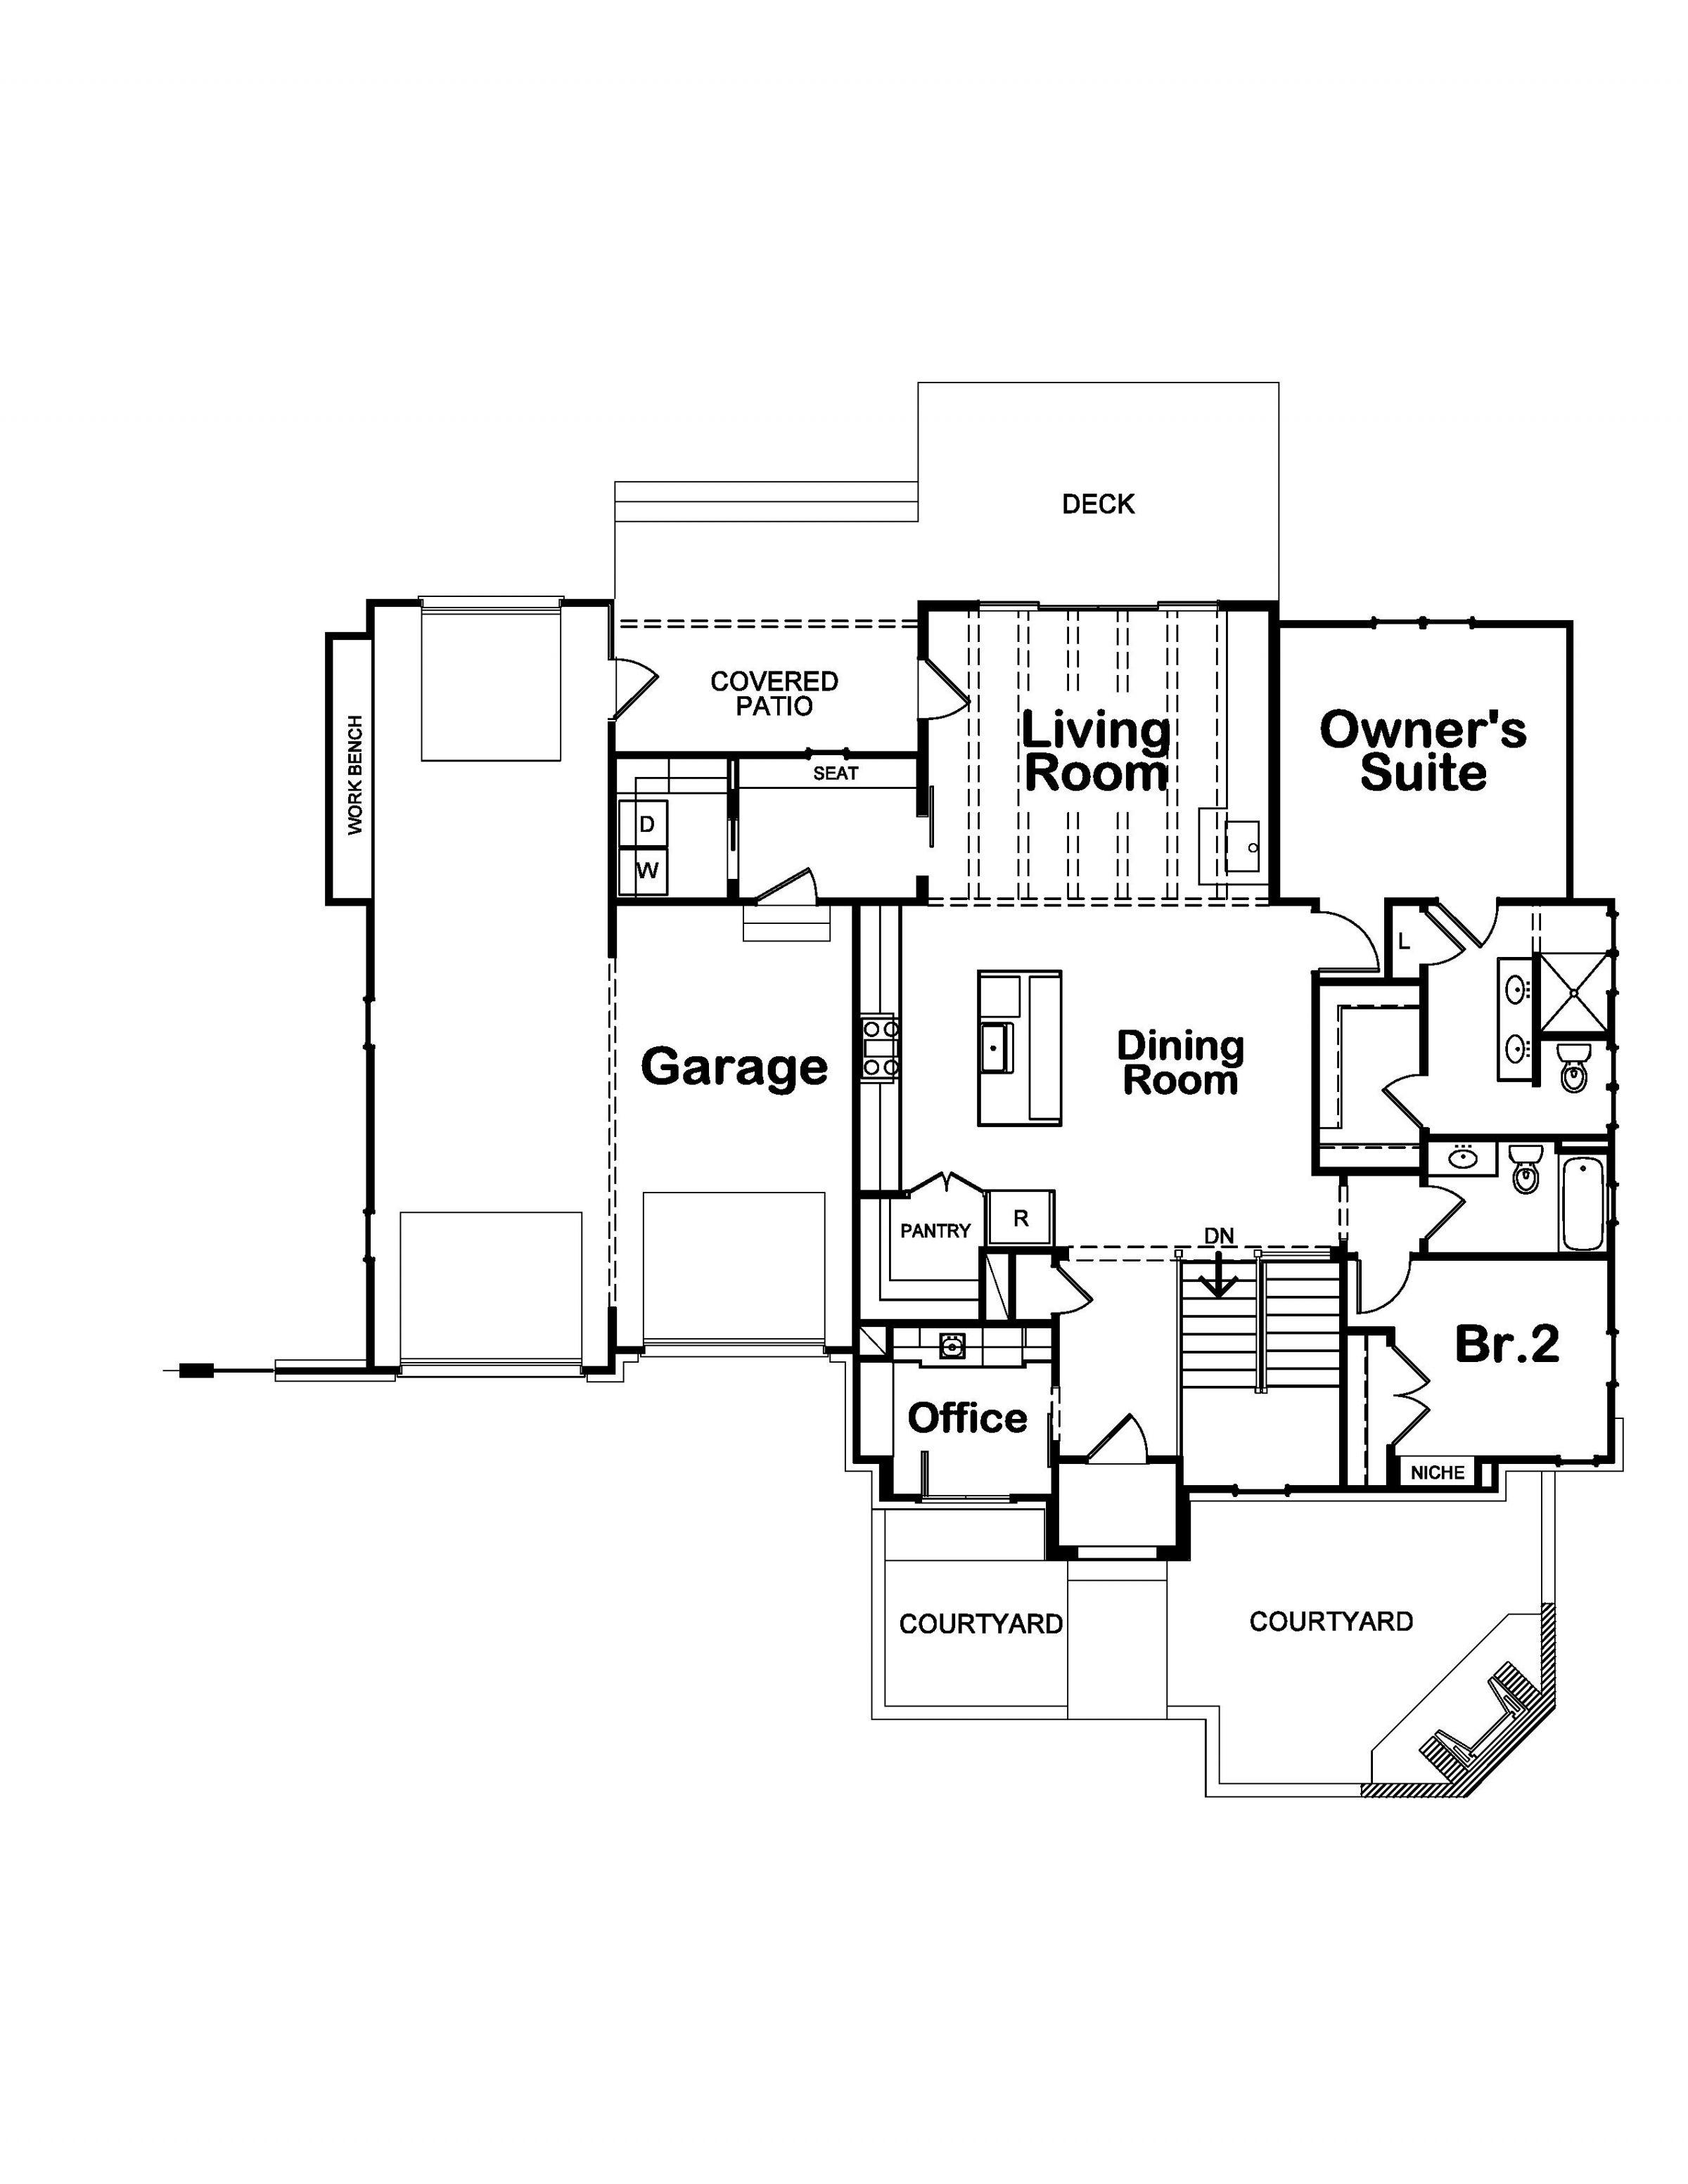 residential-warren-county-iowa-0-acres-listing-number-15598-0-2021-06-18-132840.jpg